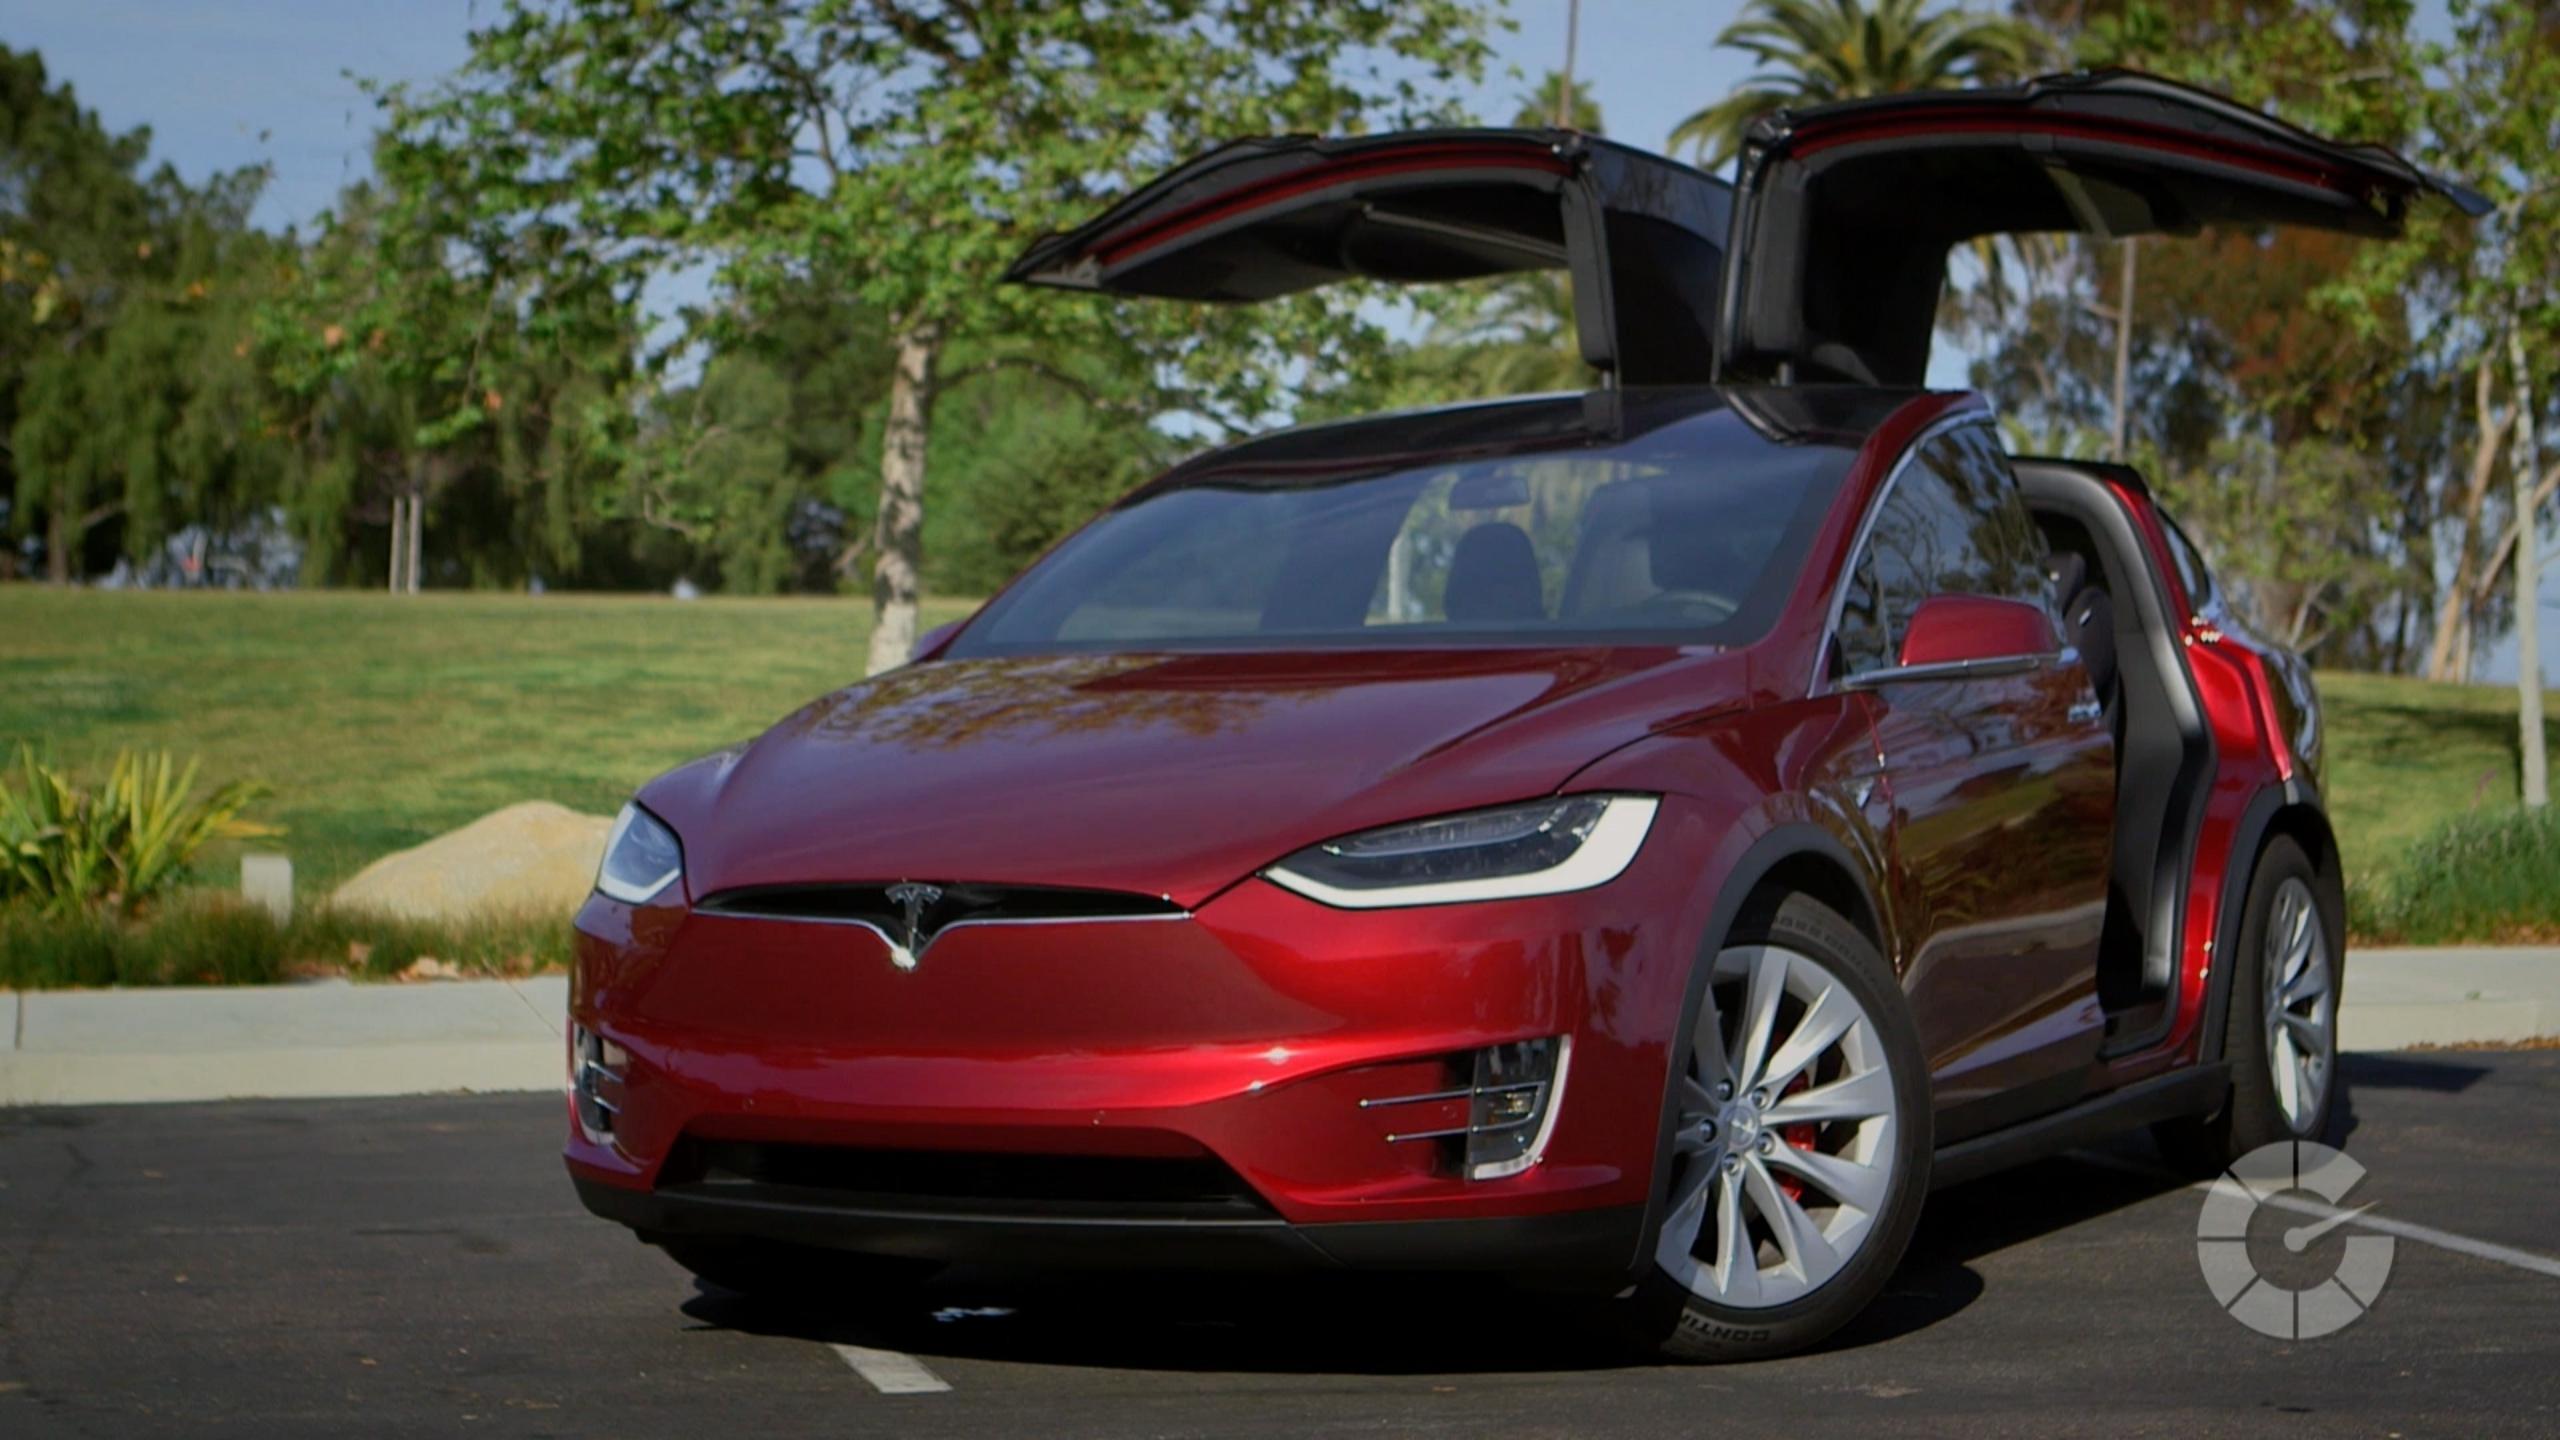 2016 tesla model x small electric suv price range - 2016 Tesla Model X Small Electric Suv Price Range 22